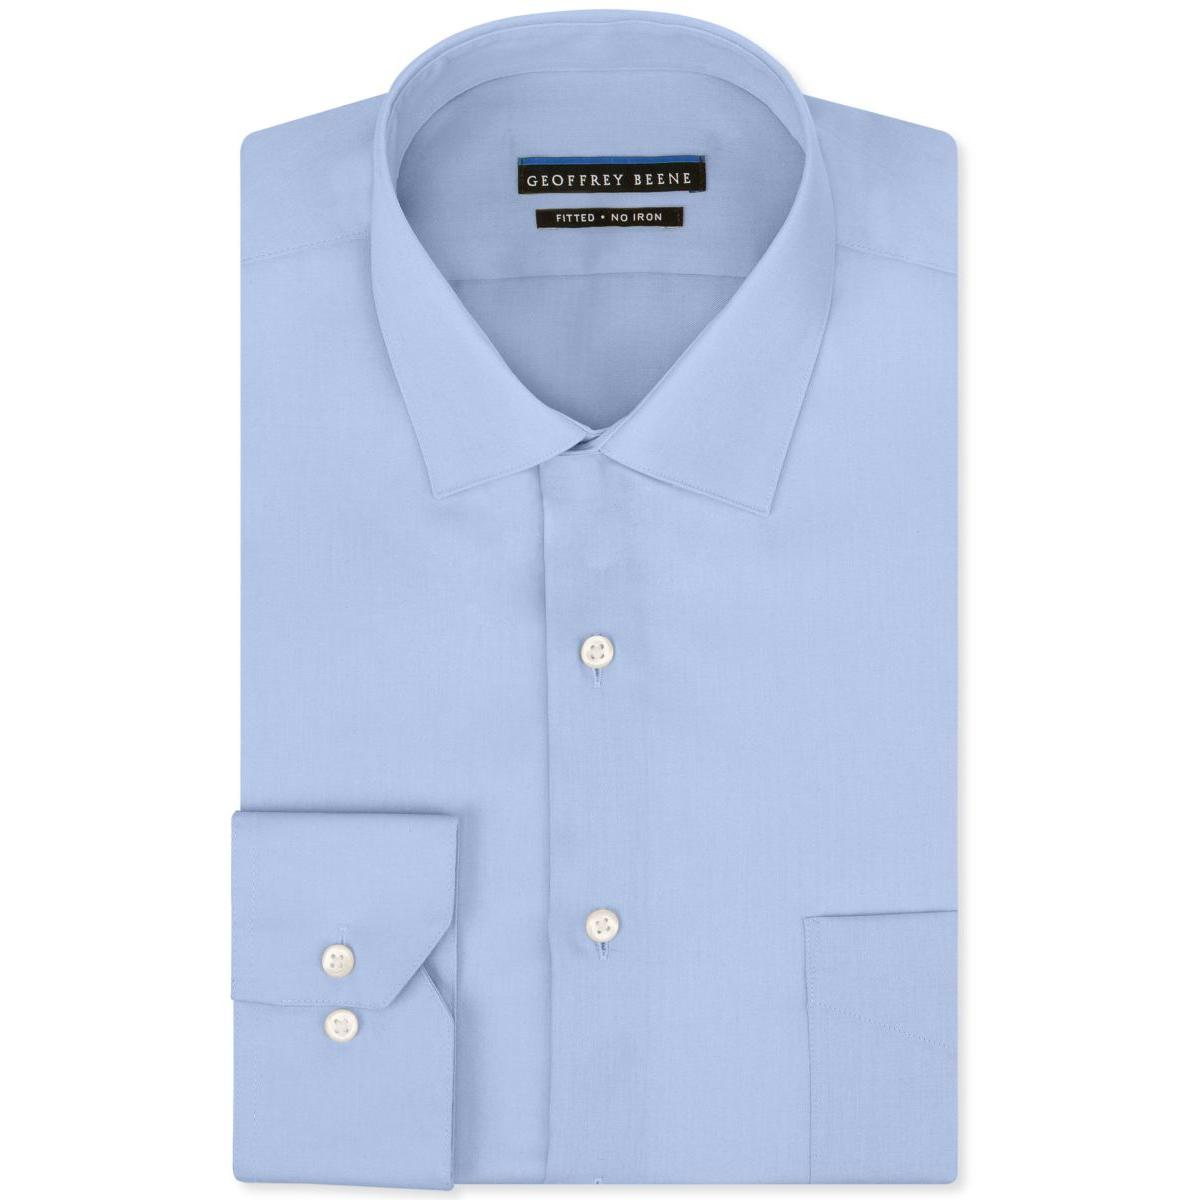 Geoffrey Beene Mens Big & Tall Tab Collar Cuff Sleeves Bu...